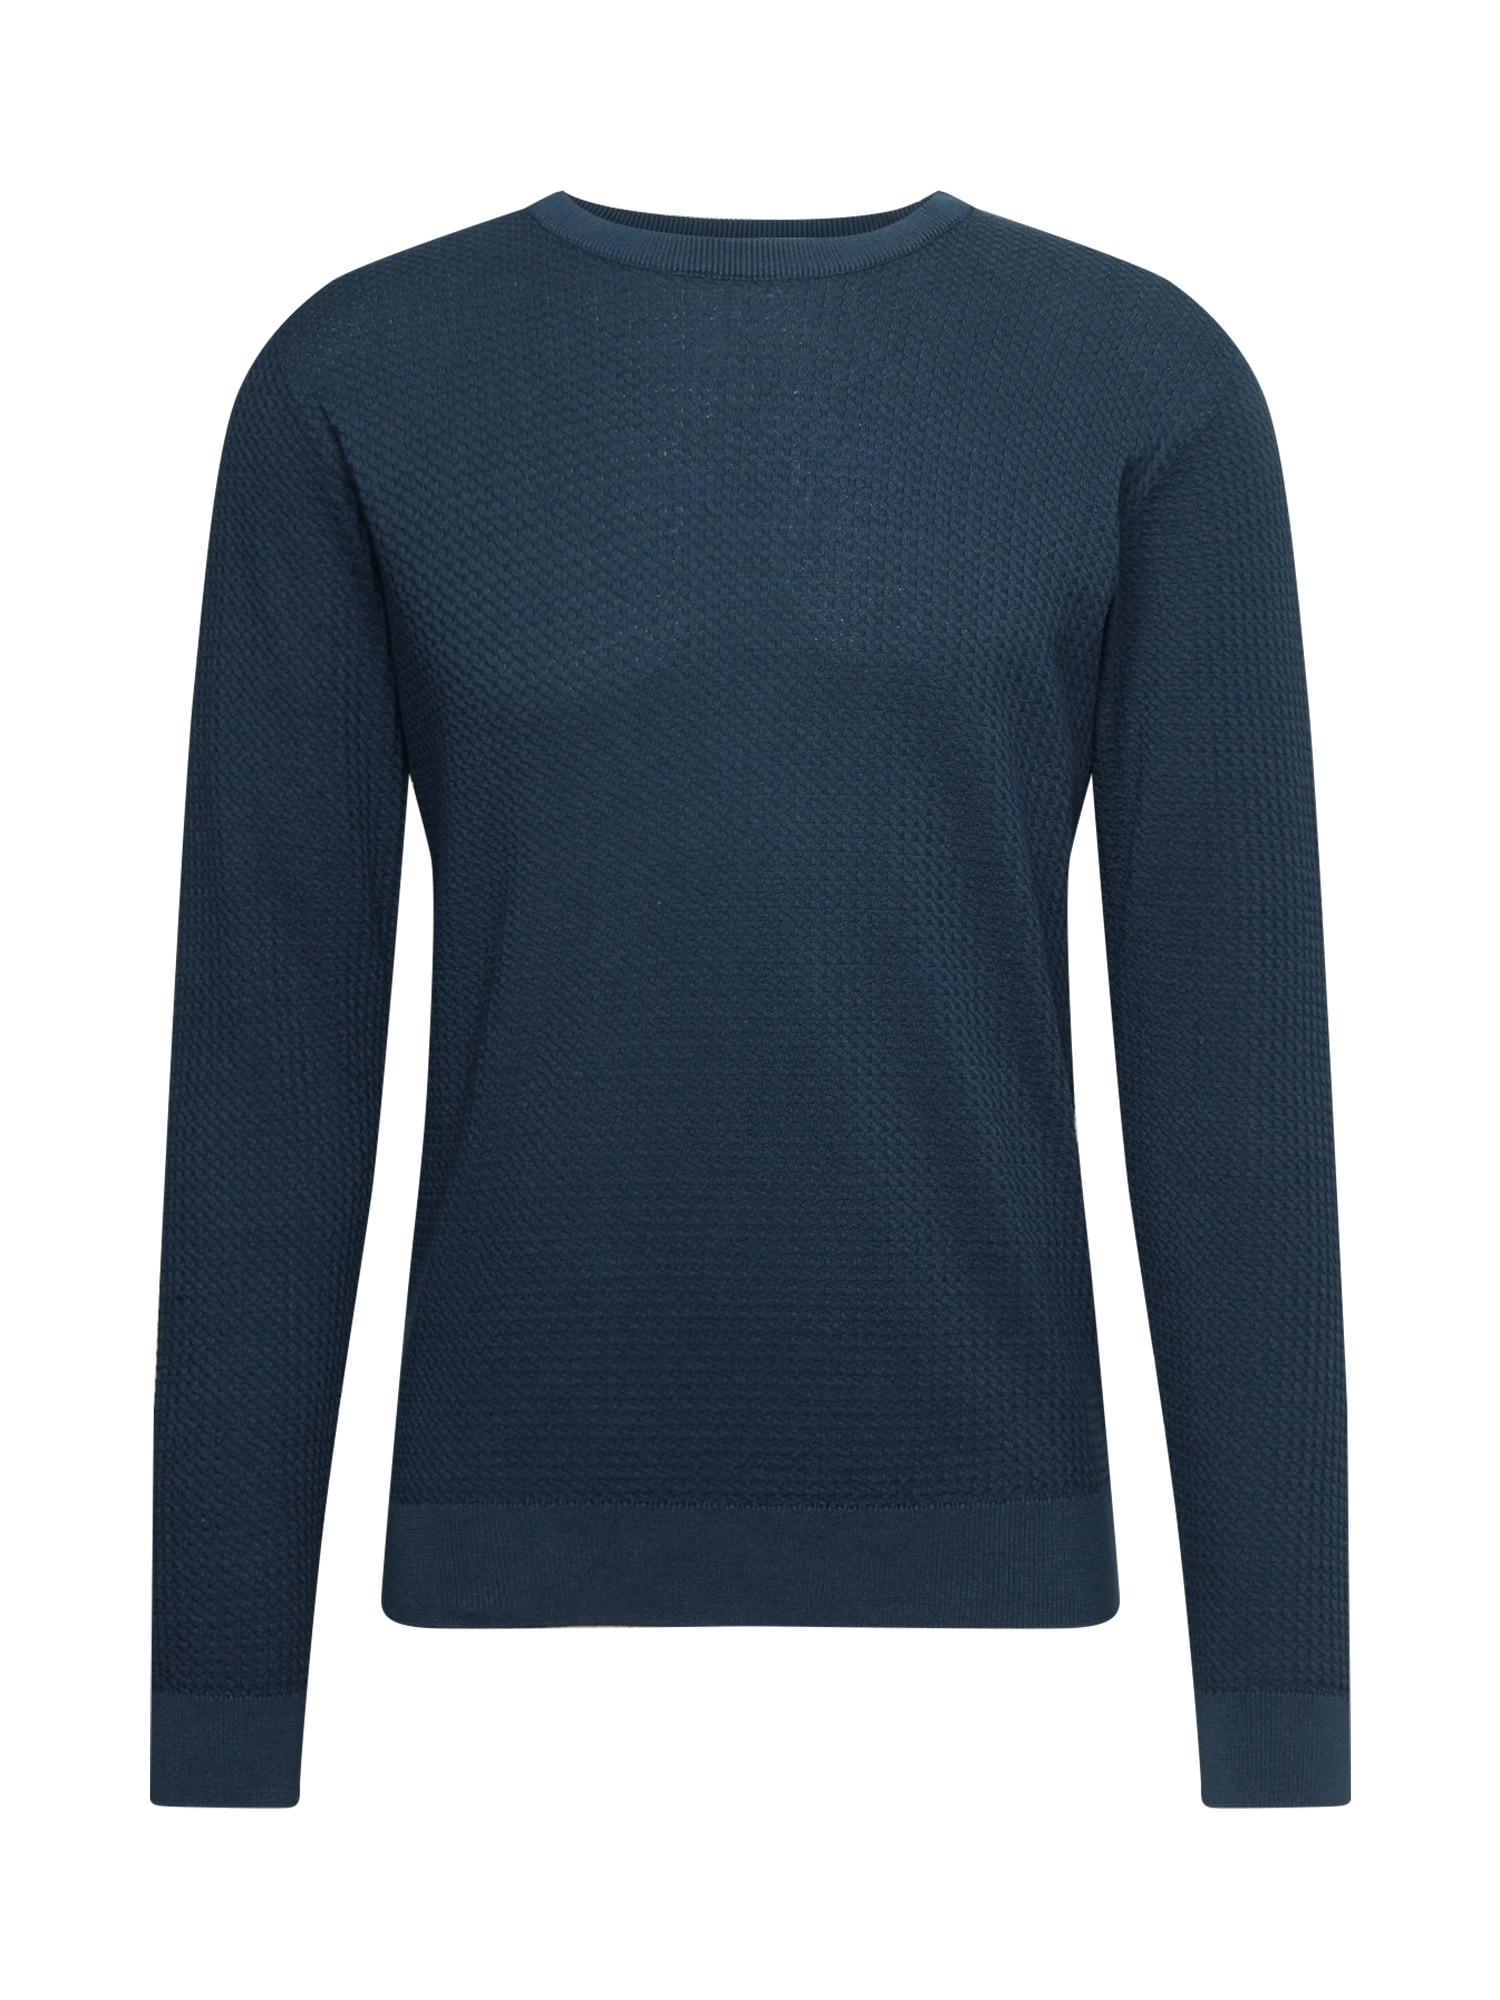 SAND COPENHAGEN Megztinis tamsiai mėlyna